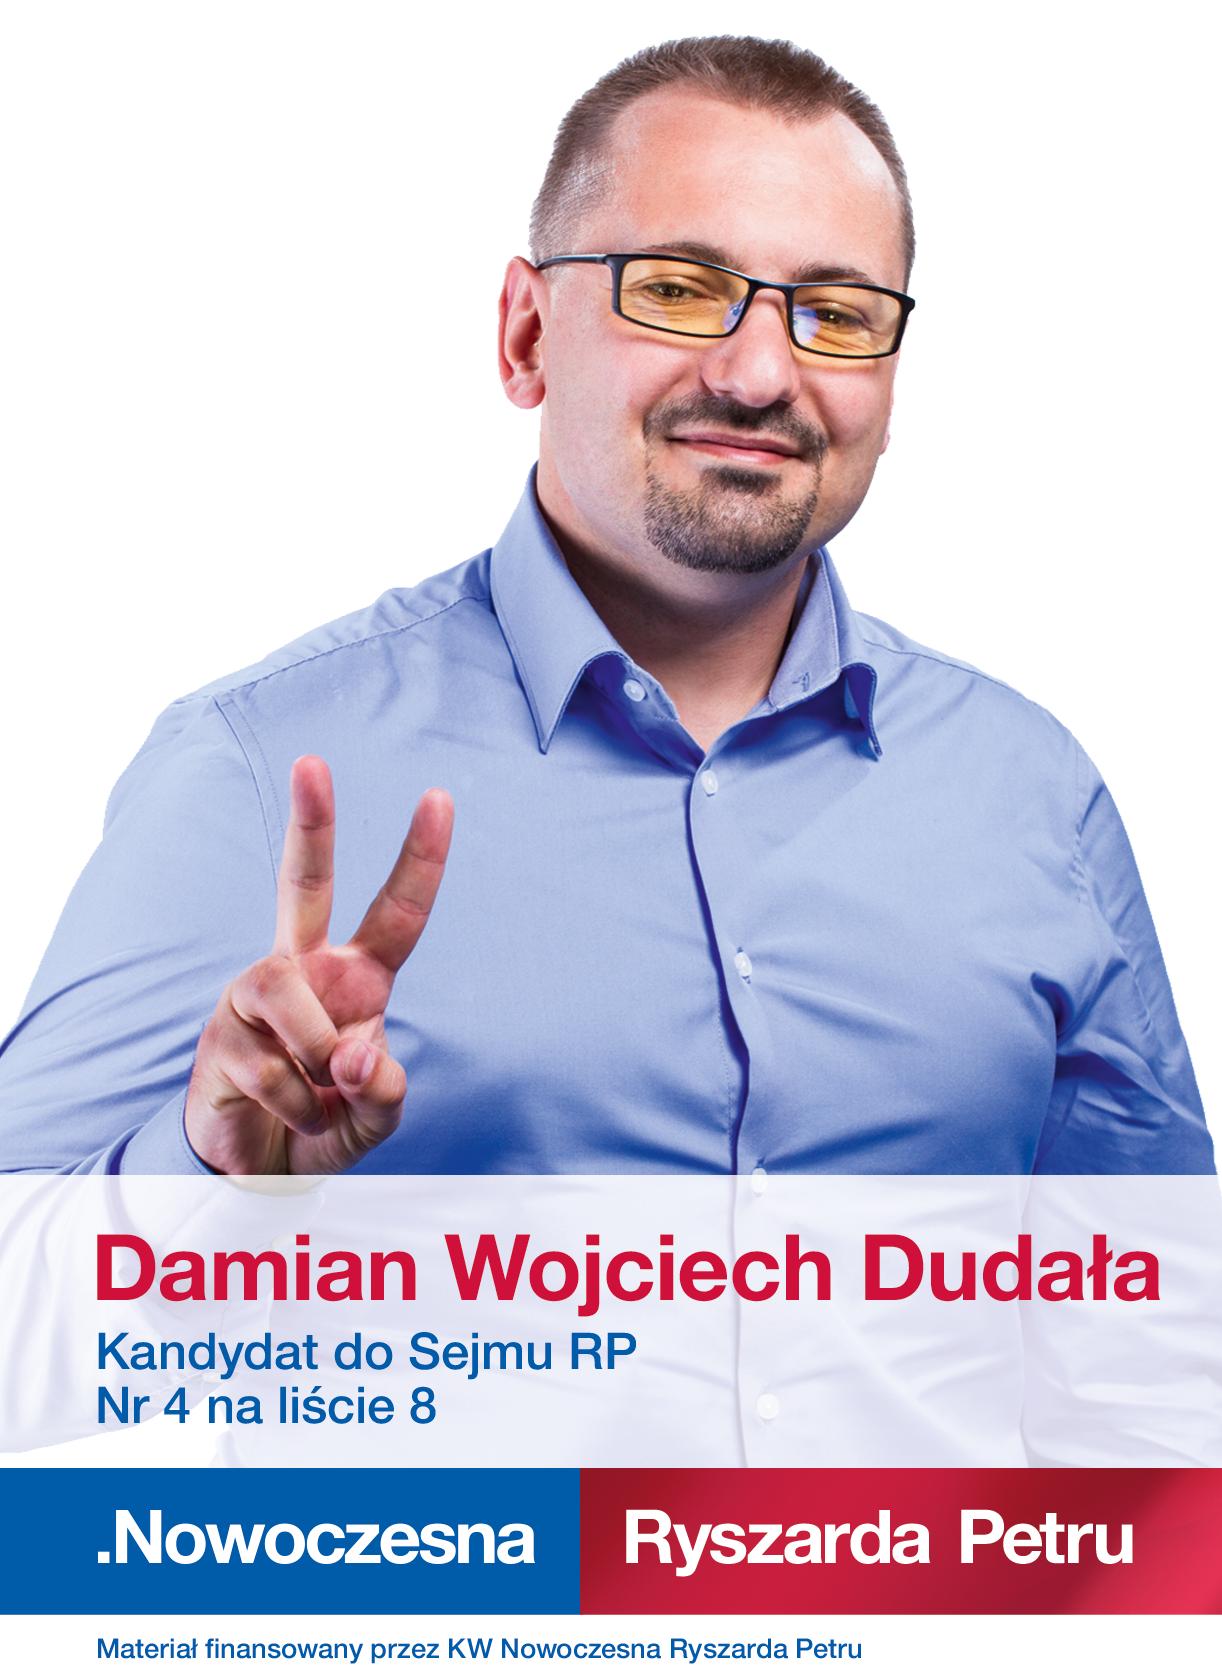 Damian Wojciech Dudala – ulotka